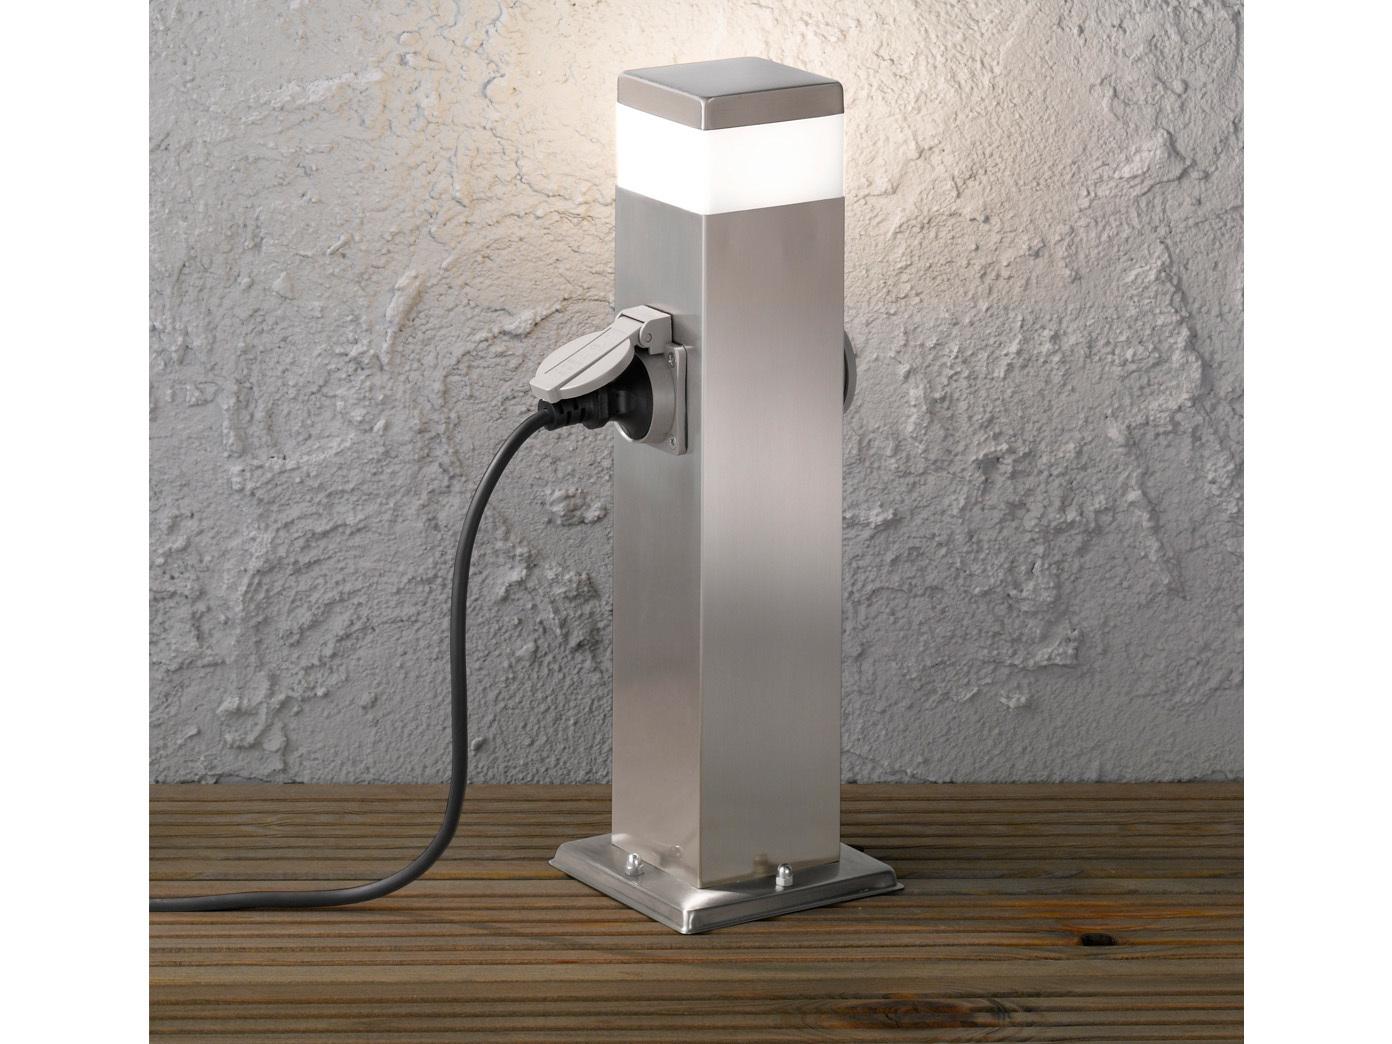 led wegeleuchte pollerleuchte 50cm mit 2 steckdosen. Black Bedroom Furniture Sets. Home Design Ideas